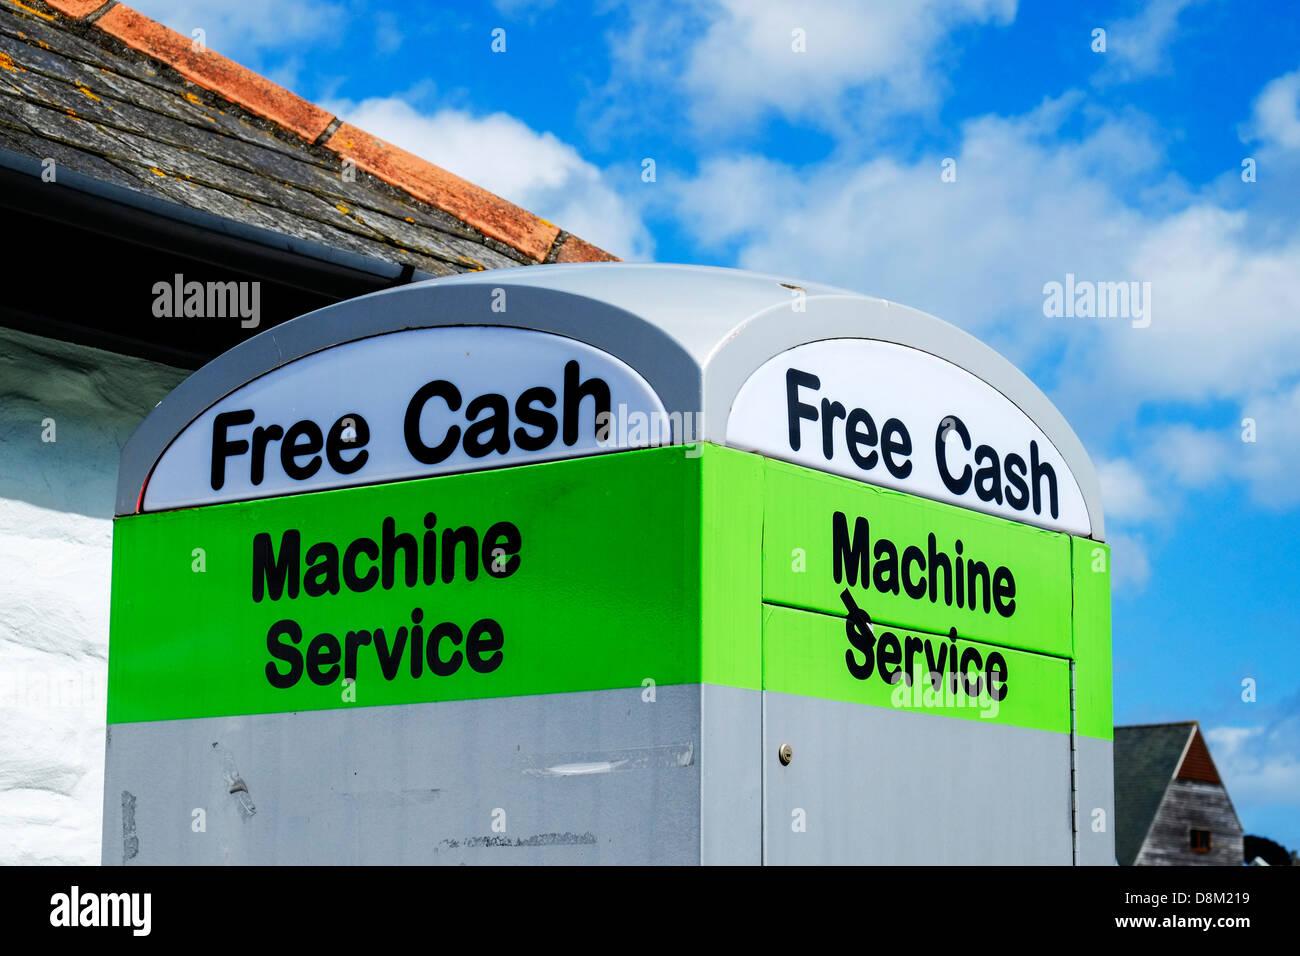 Dispenser|money Stockfotos & Dispenser|money Bilder - Seite 11 - Alamy